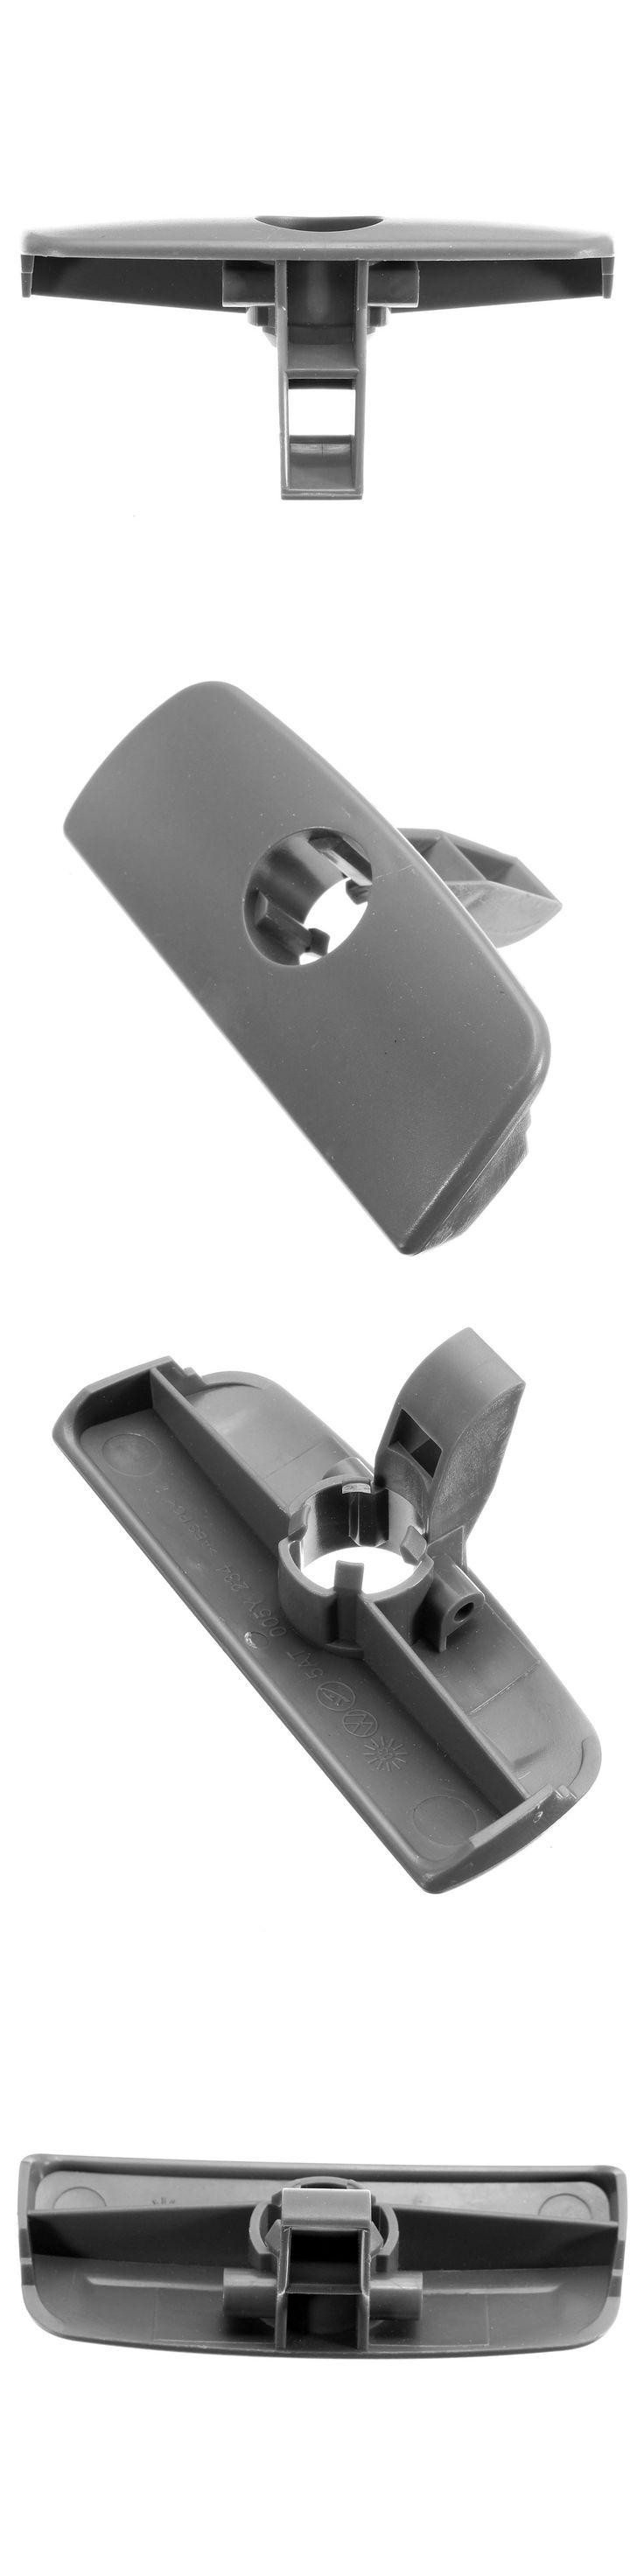 New Car Styling Glove Box Cover Handle KeyHole Lock 06B129723J 06B 129 723 J for VW Passat B5 1998-2005